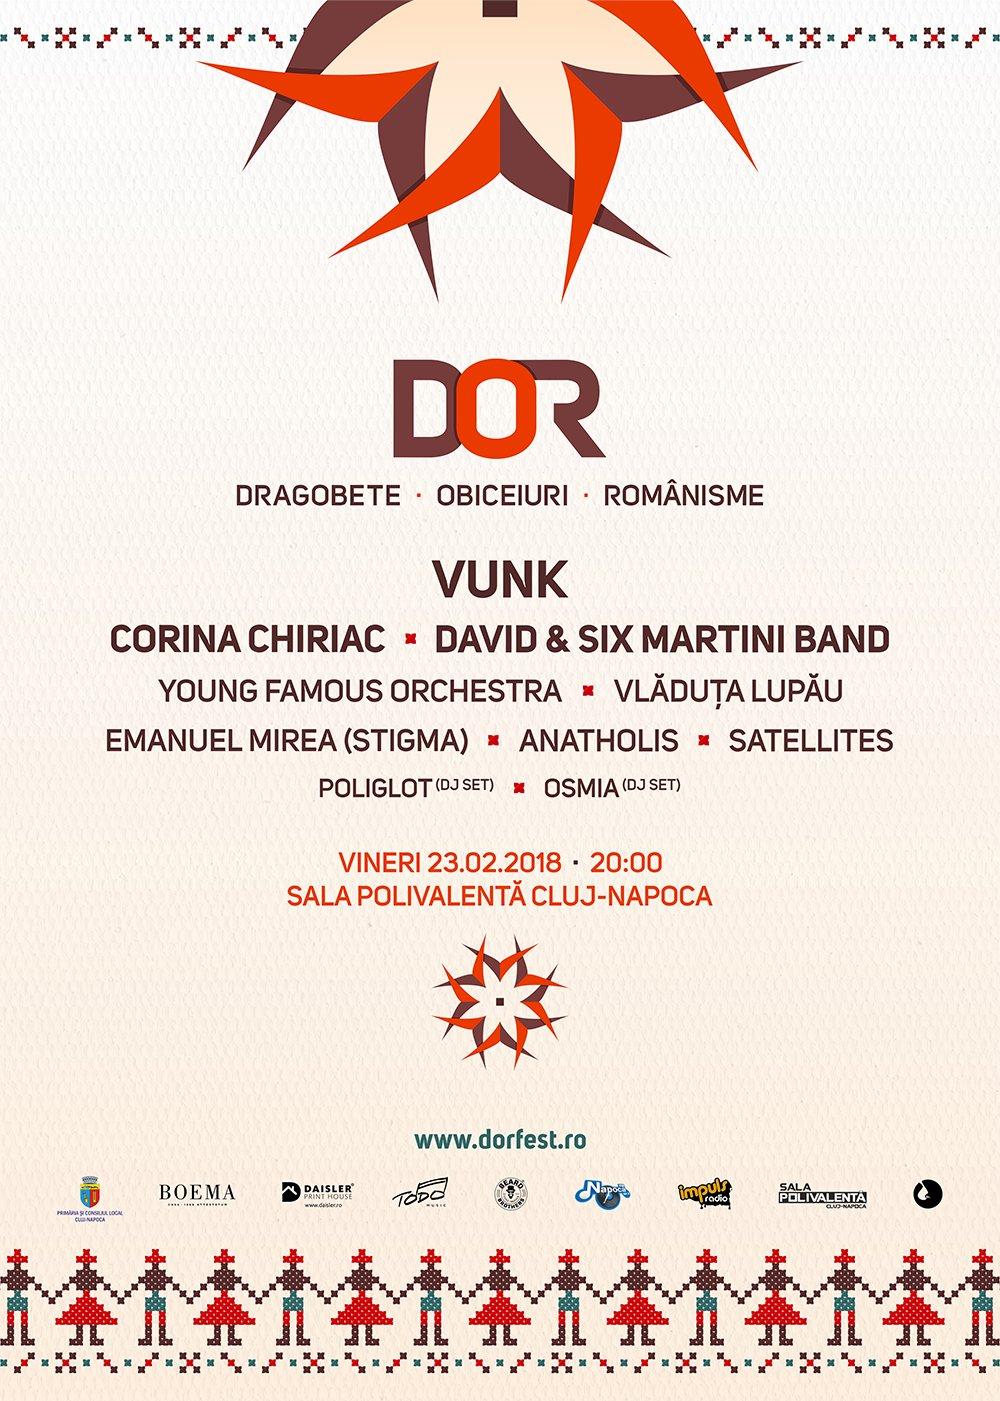 DOR (Dragobete, Obiceiuri, Românisme) la Sala Polivalentă Cluj-Napoca